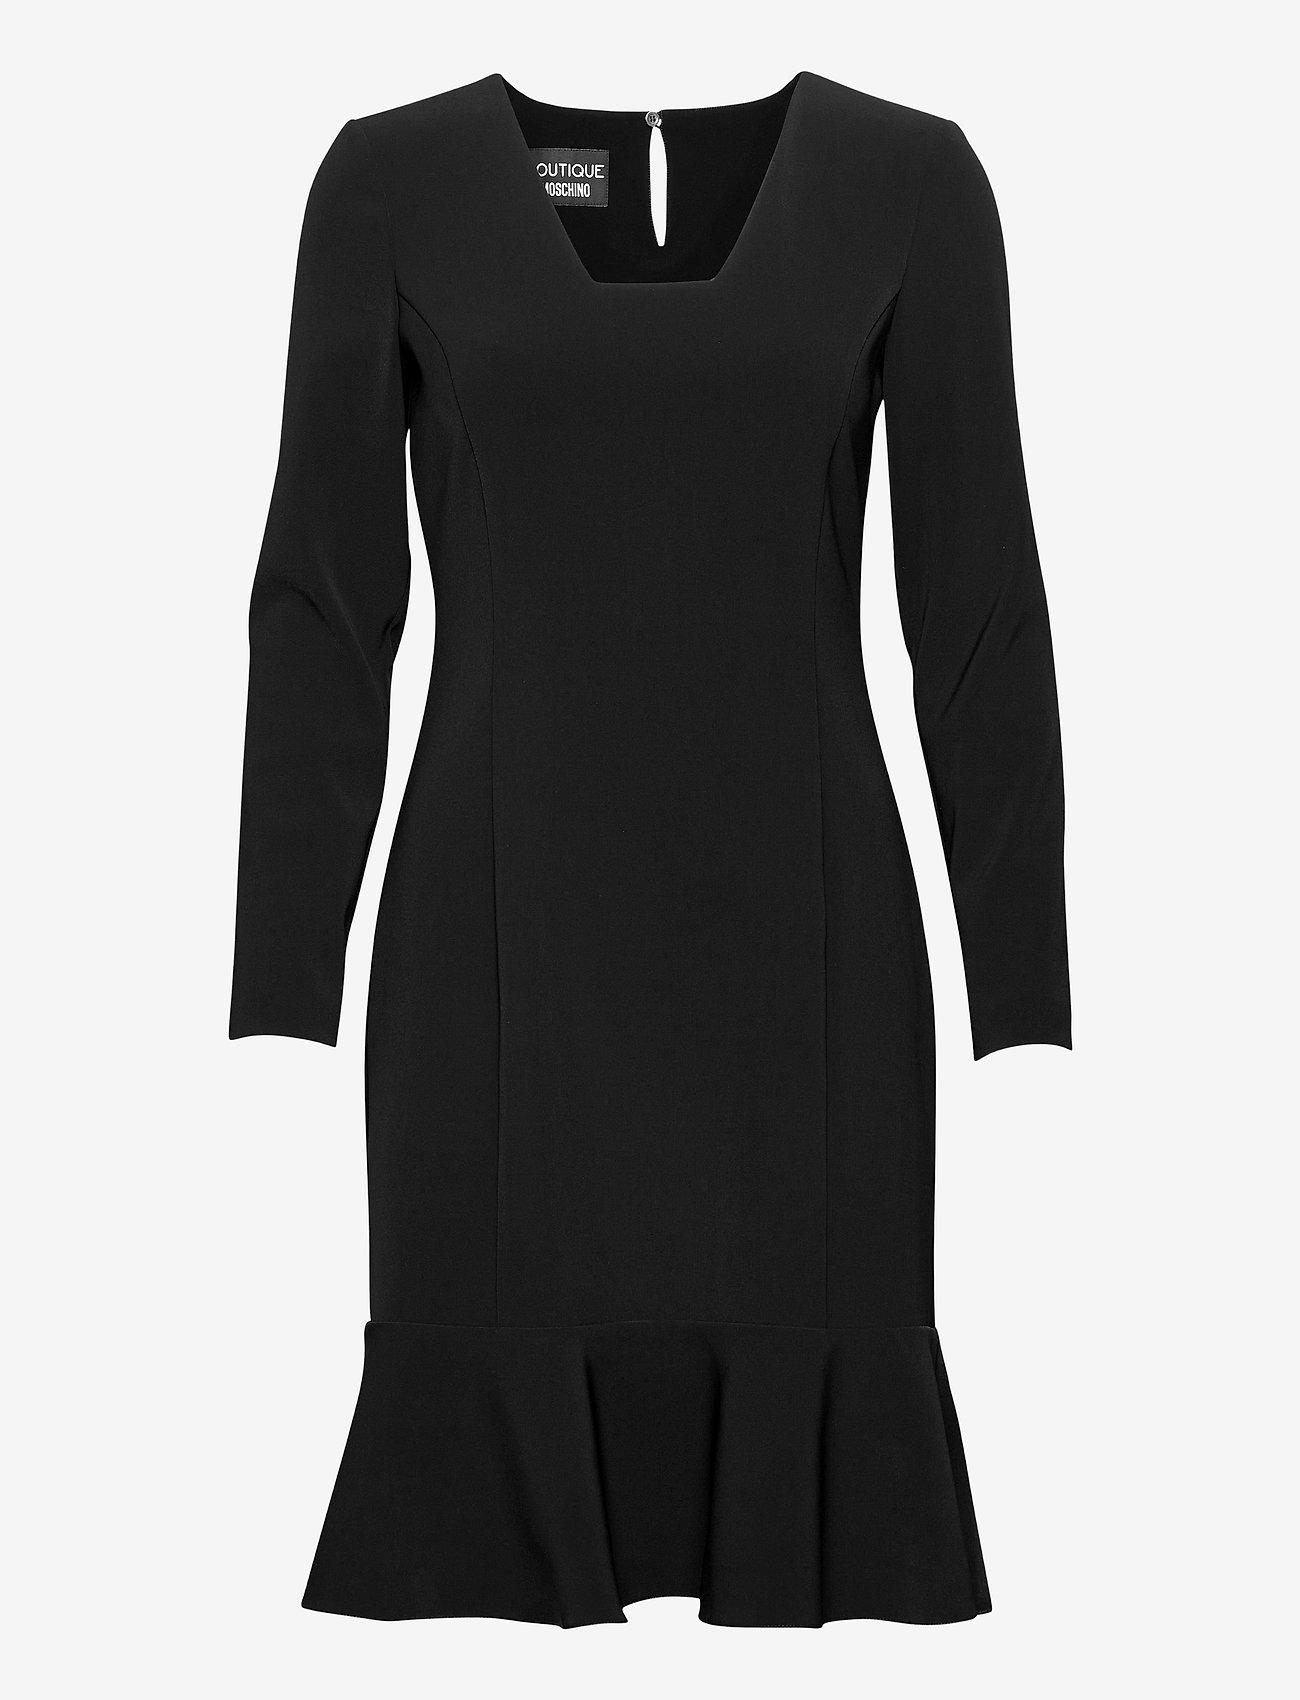 Boutique Moschino - Boutique Moschino DRESS - cocktailkjoler - black - 0